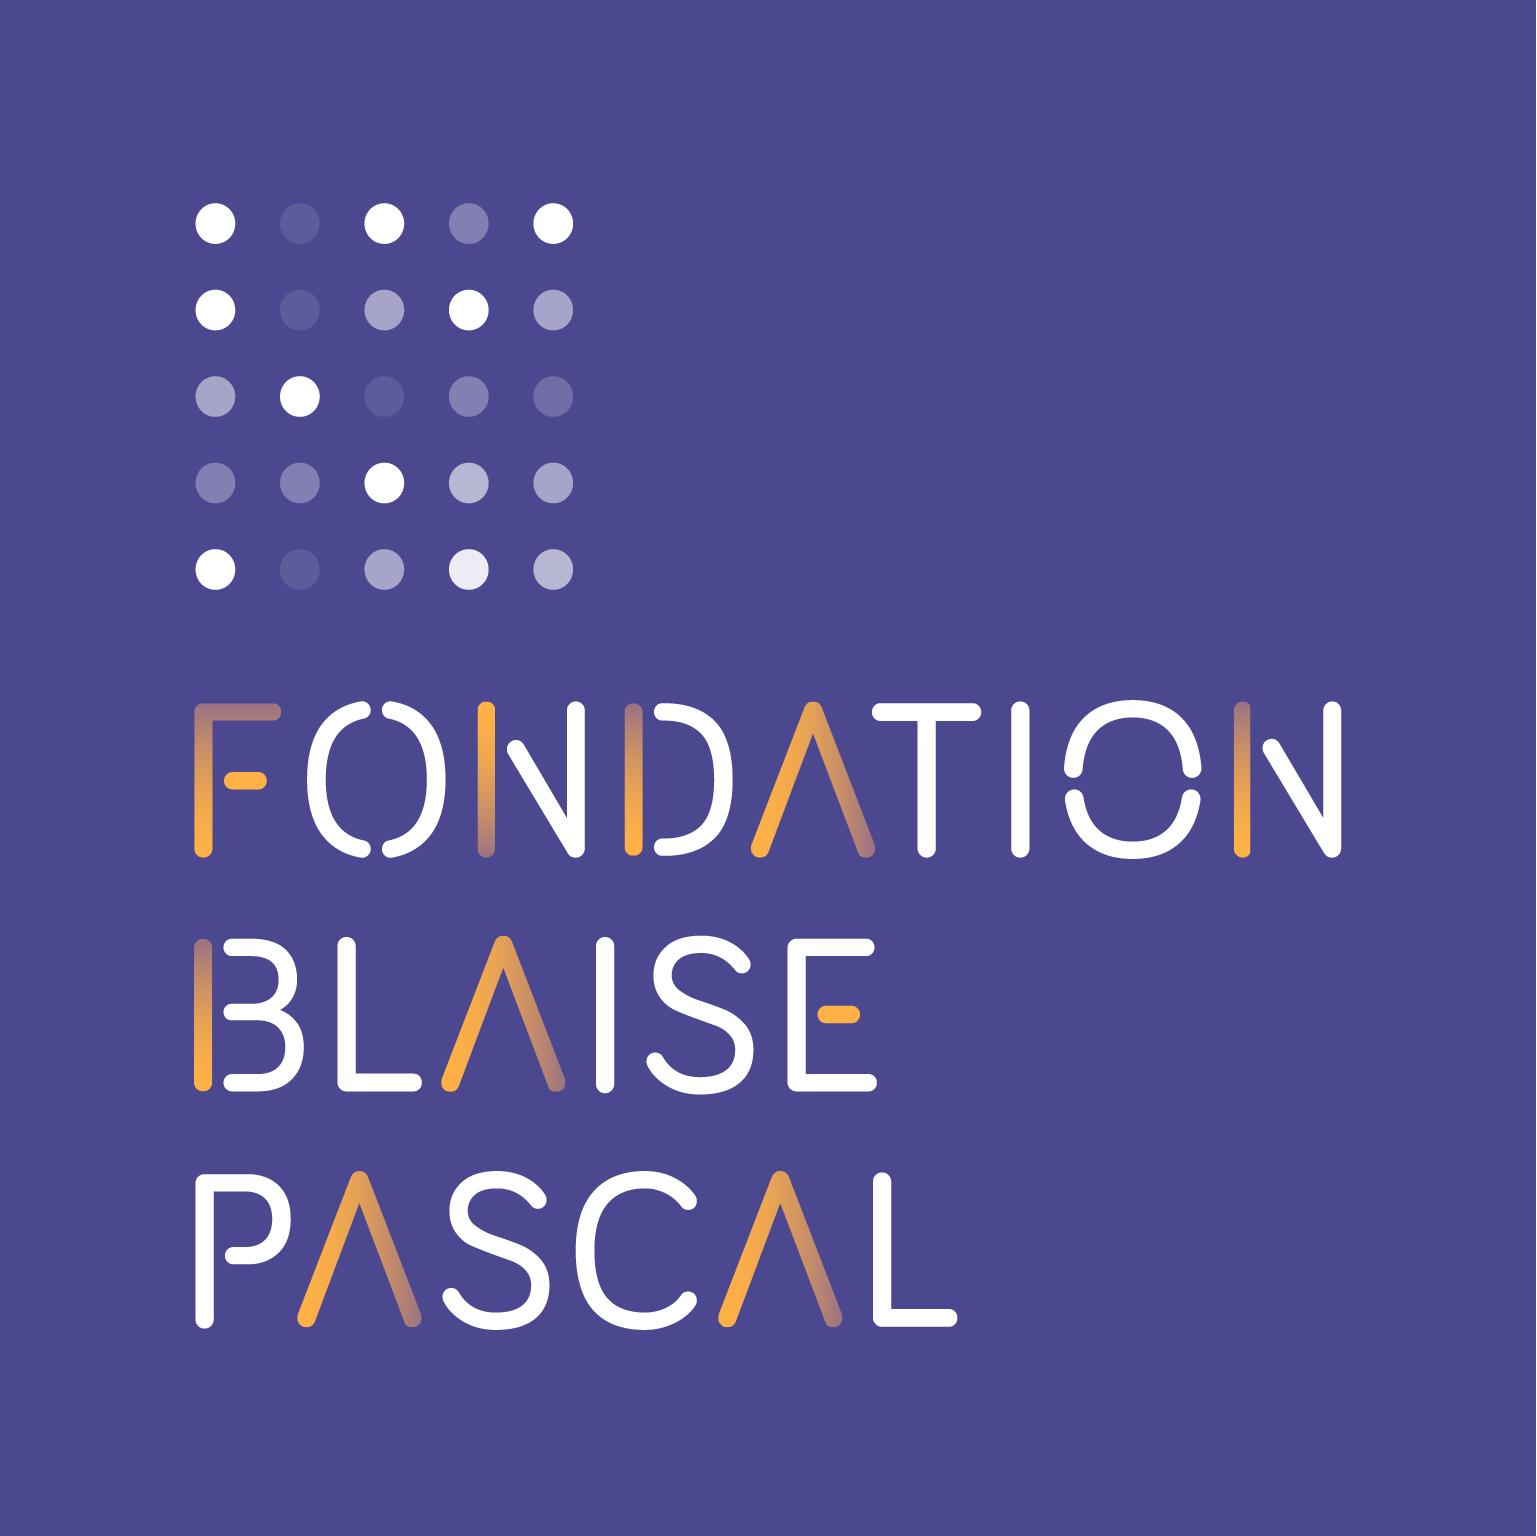 Fondation-Blaise-Pascal-logo